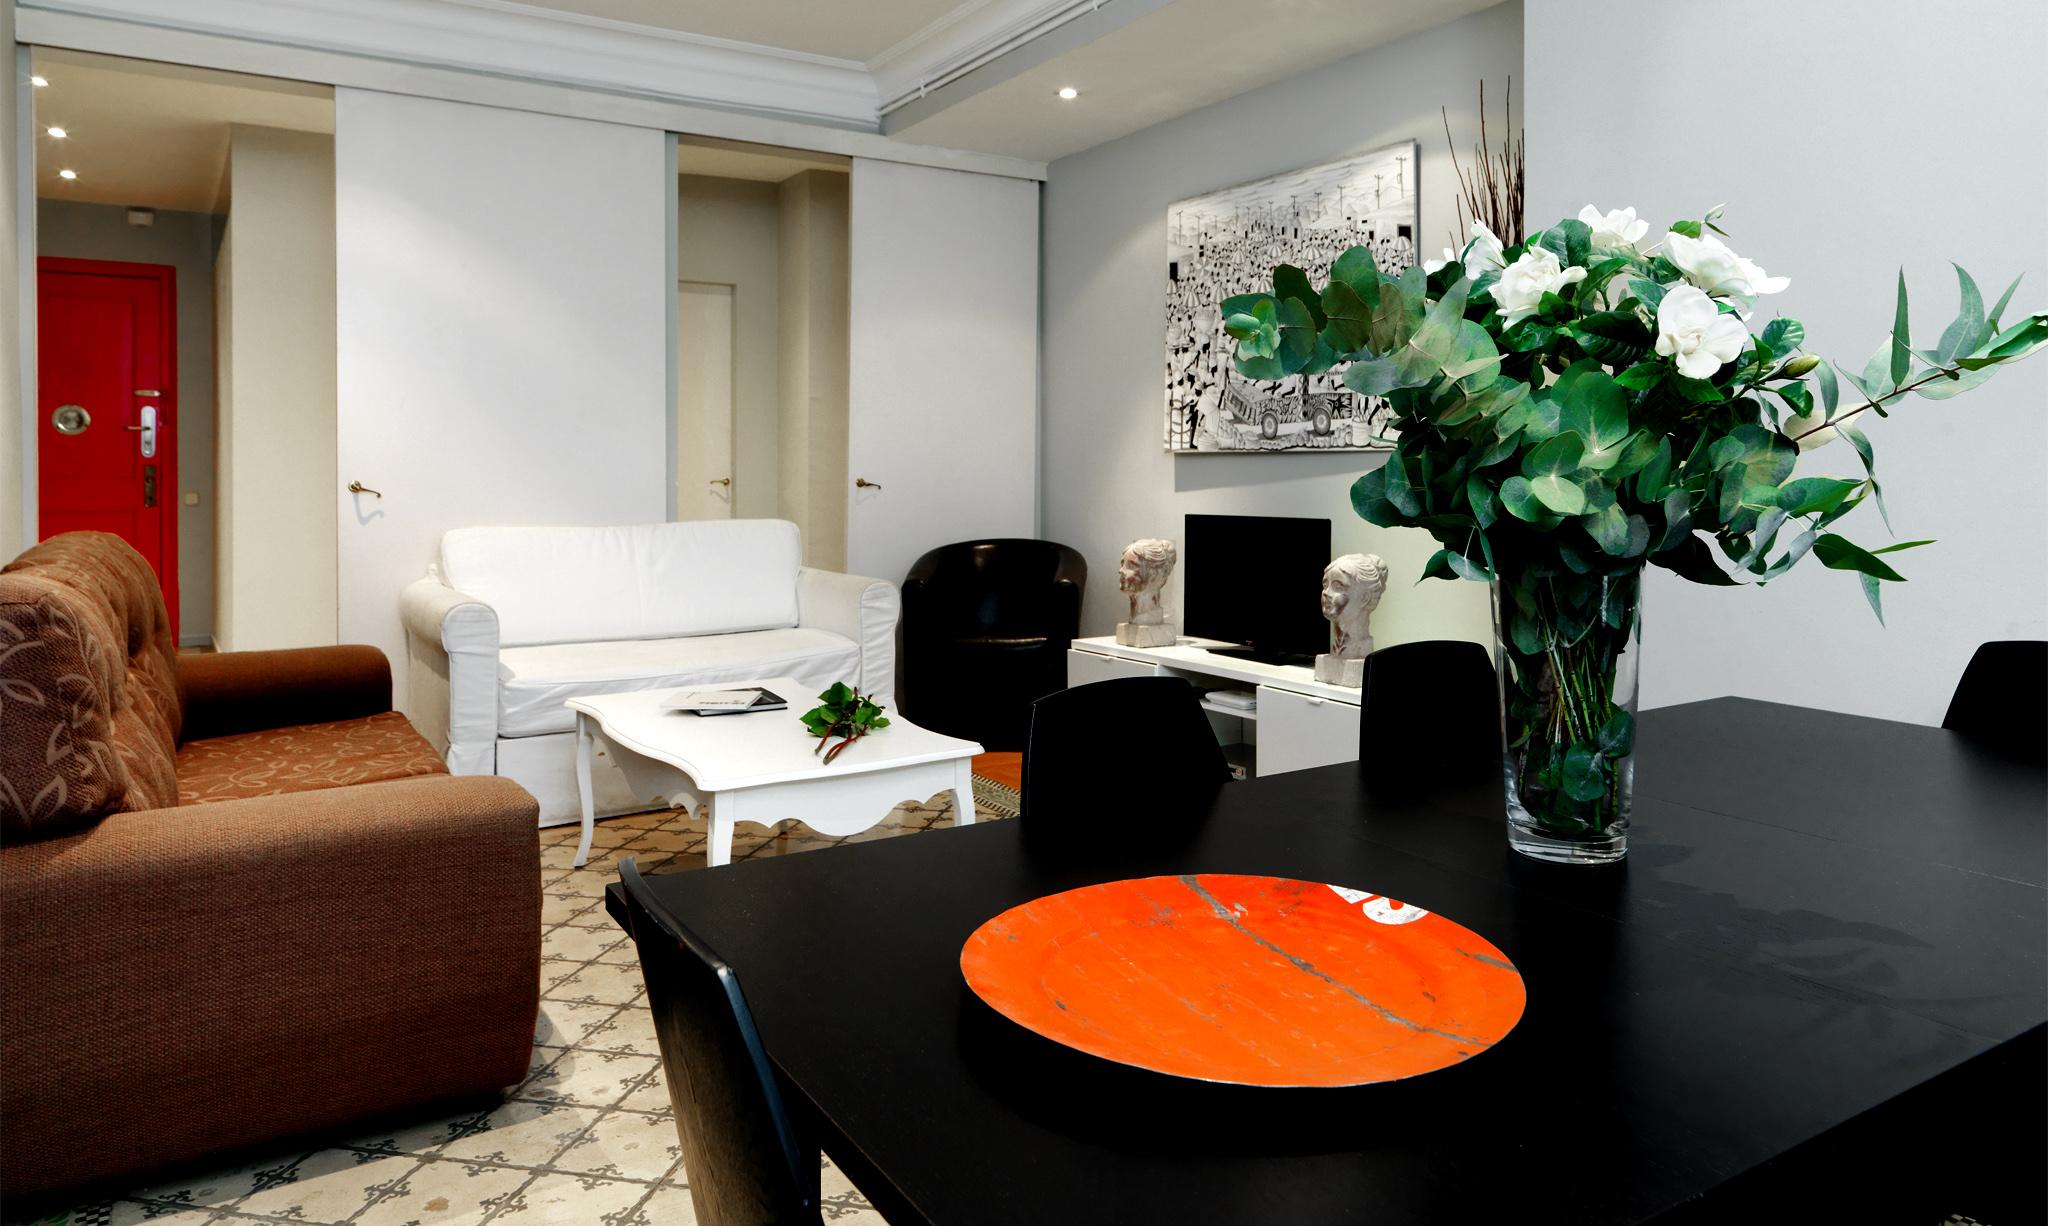 Fewdaysbarcelona rent luxury apartments in barcelonarent for Barcelona apartment